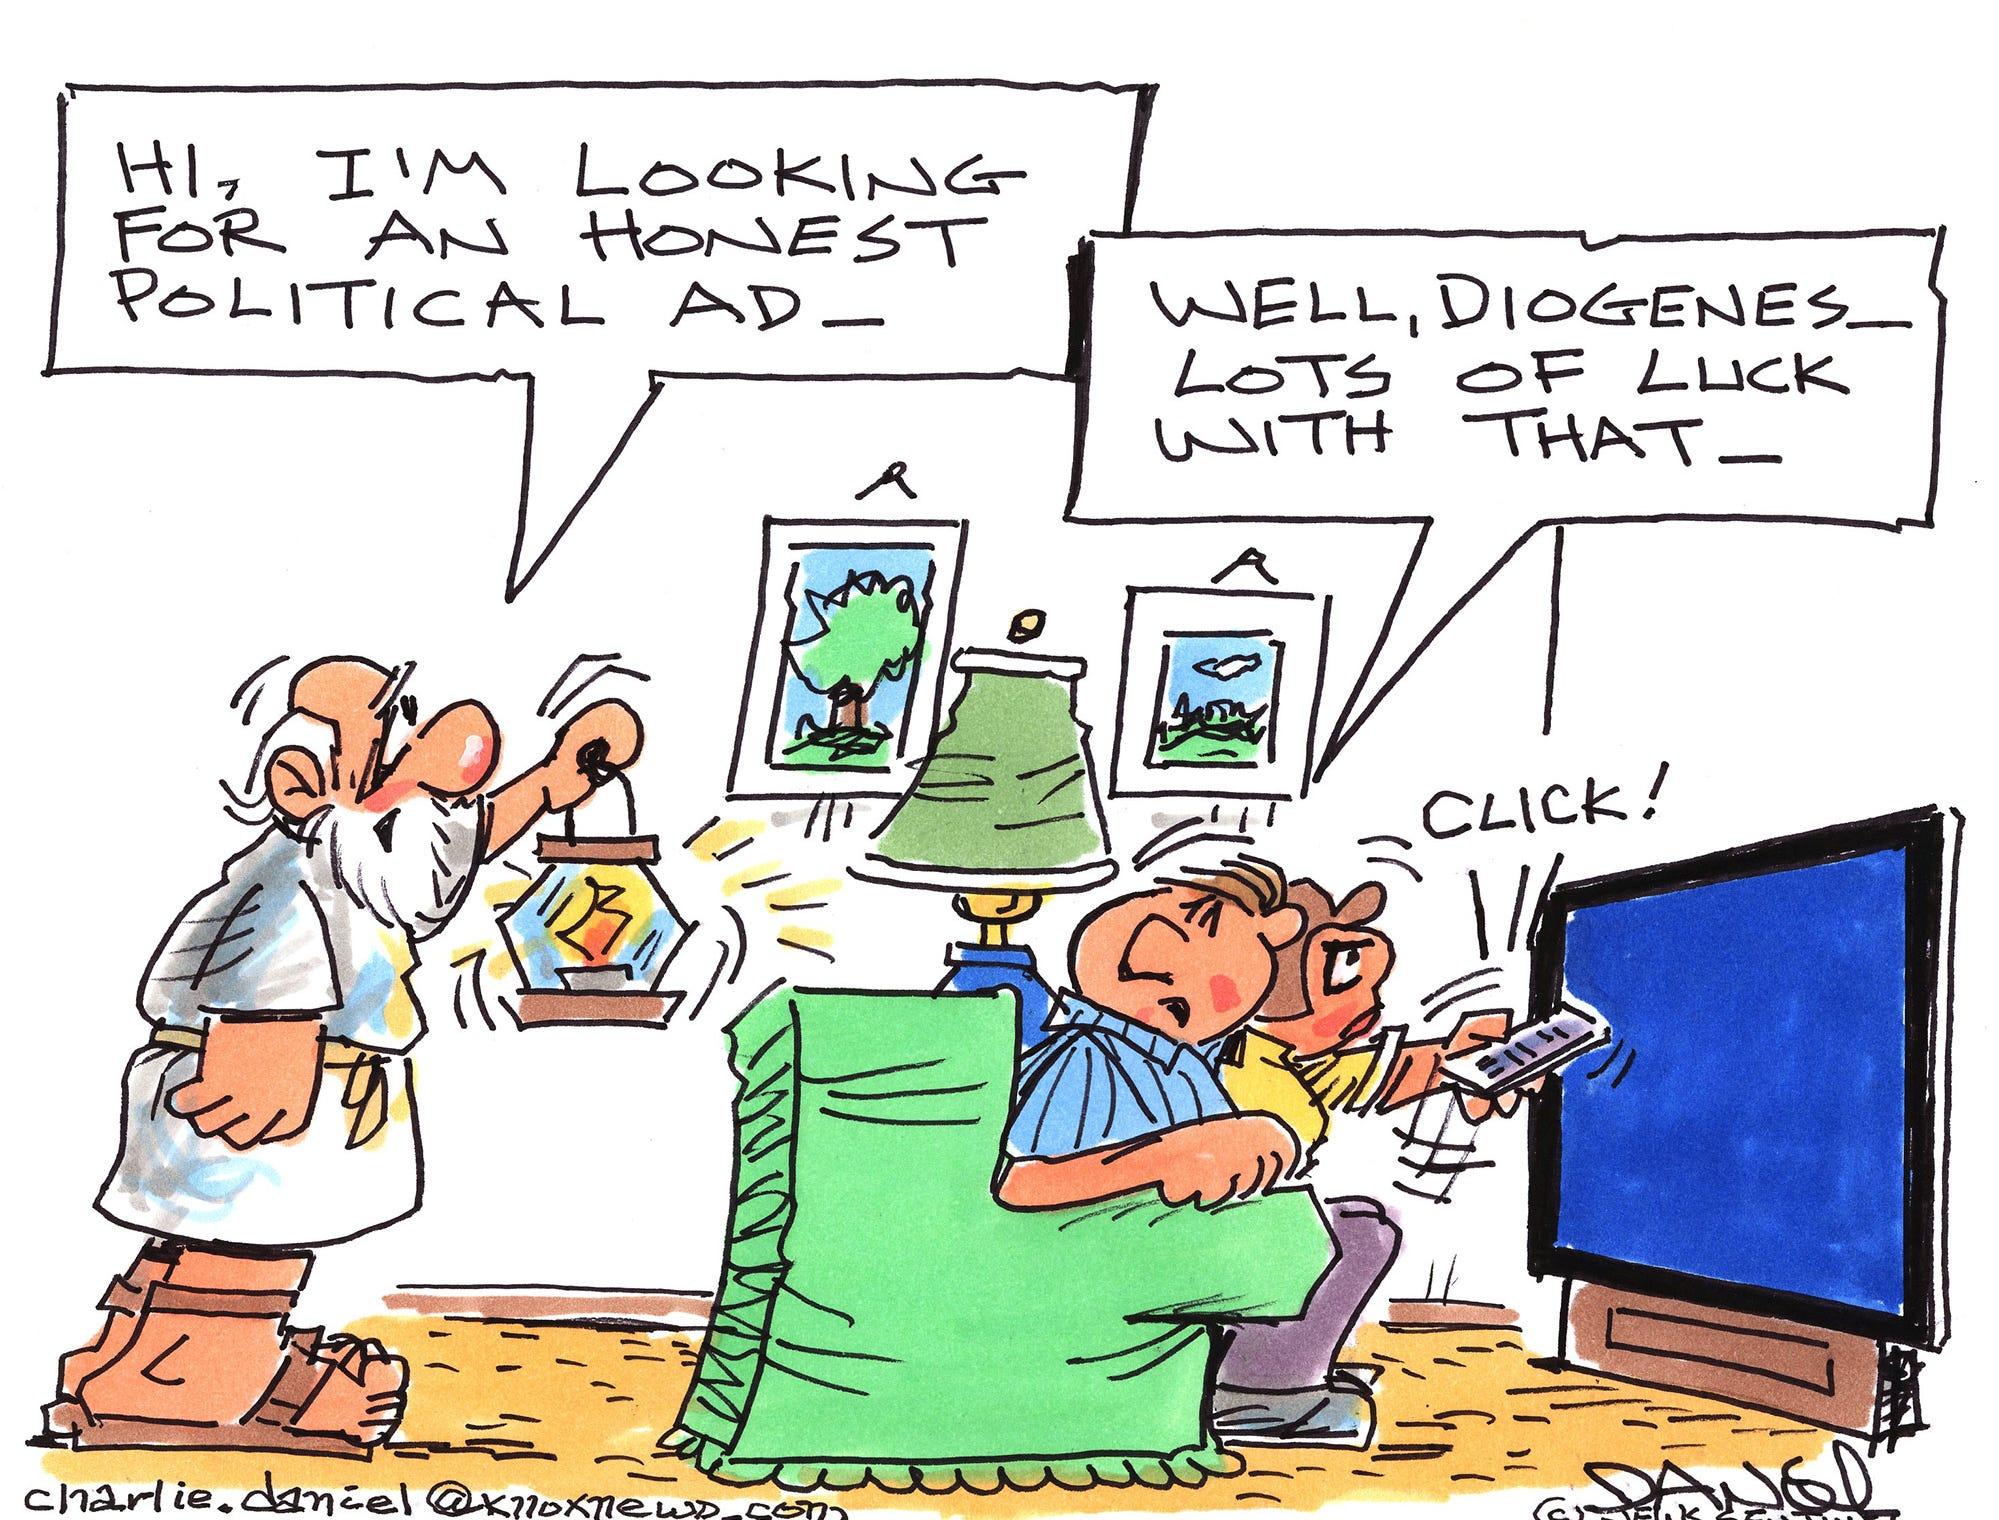 Charlie Daniel editorial cartoon for Tuesday, Oct. 16, 2018.